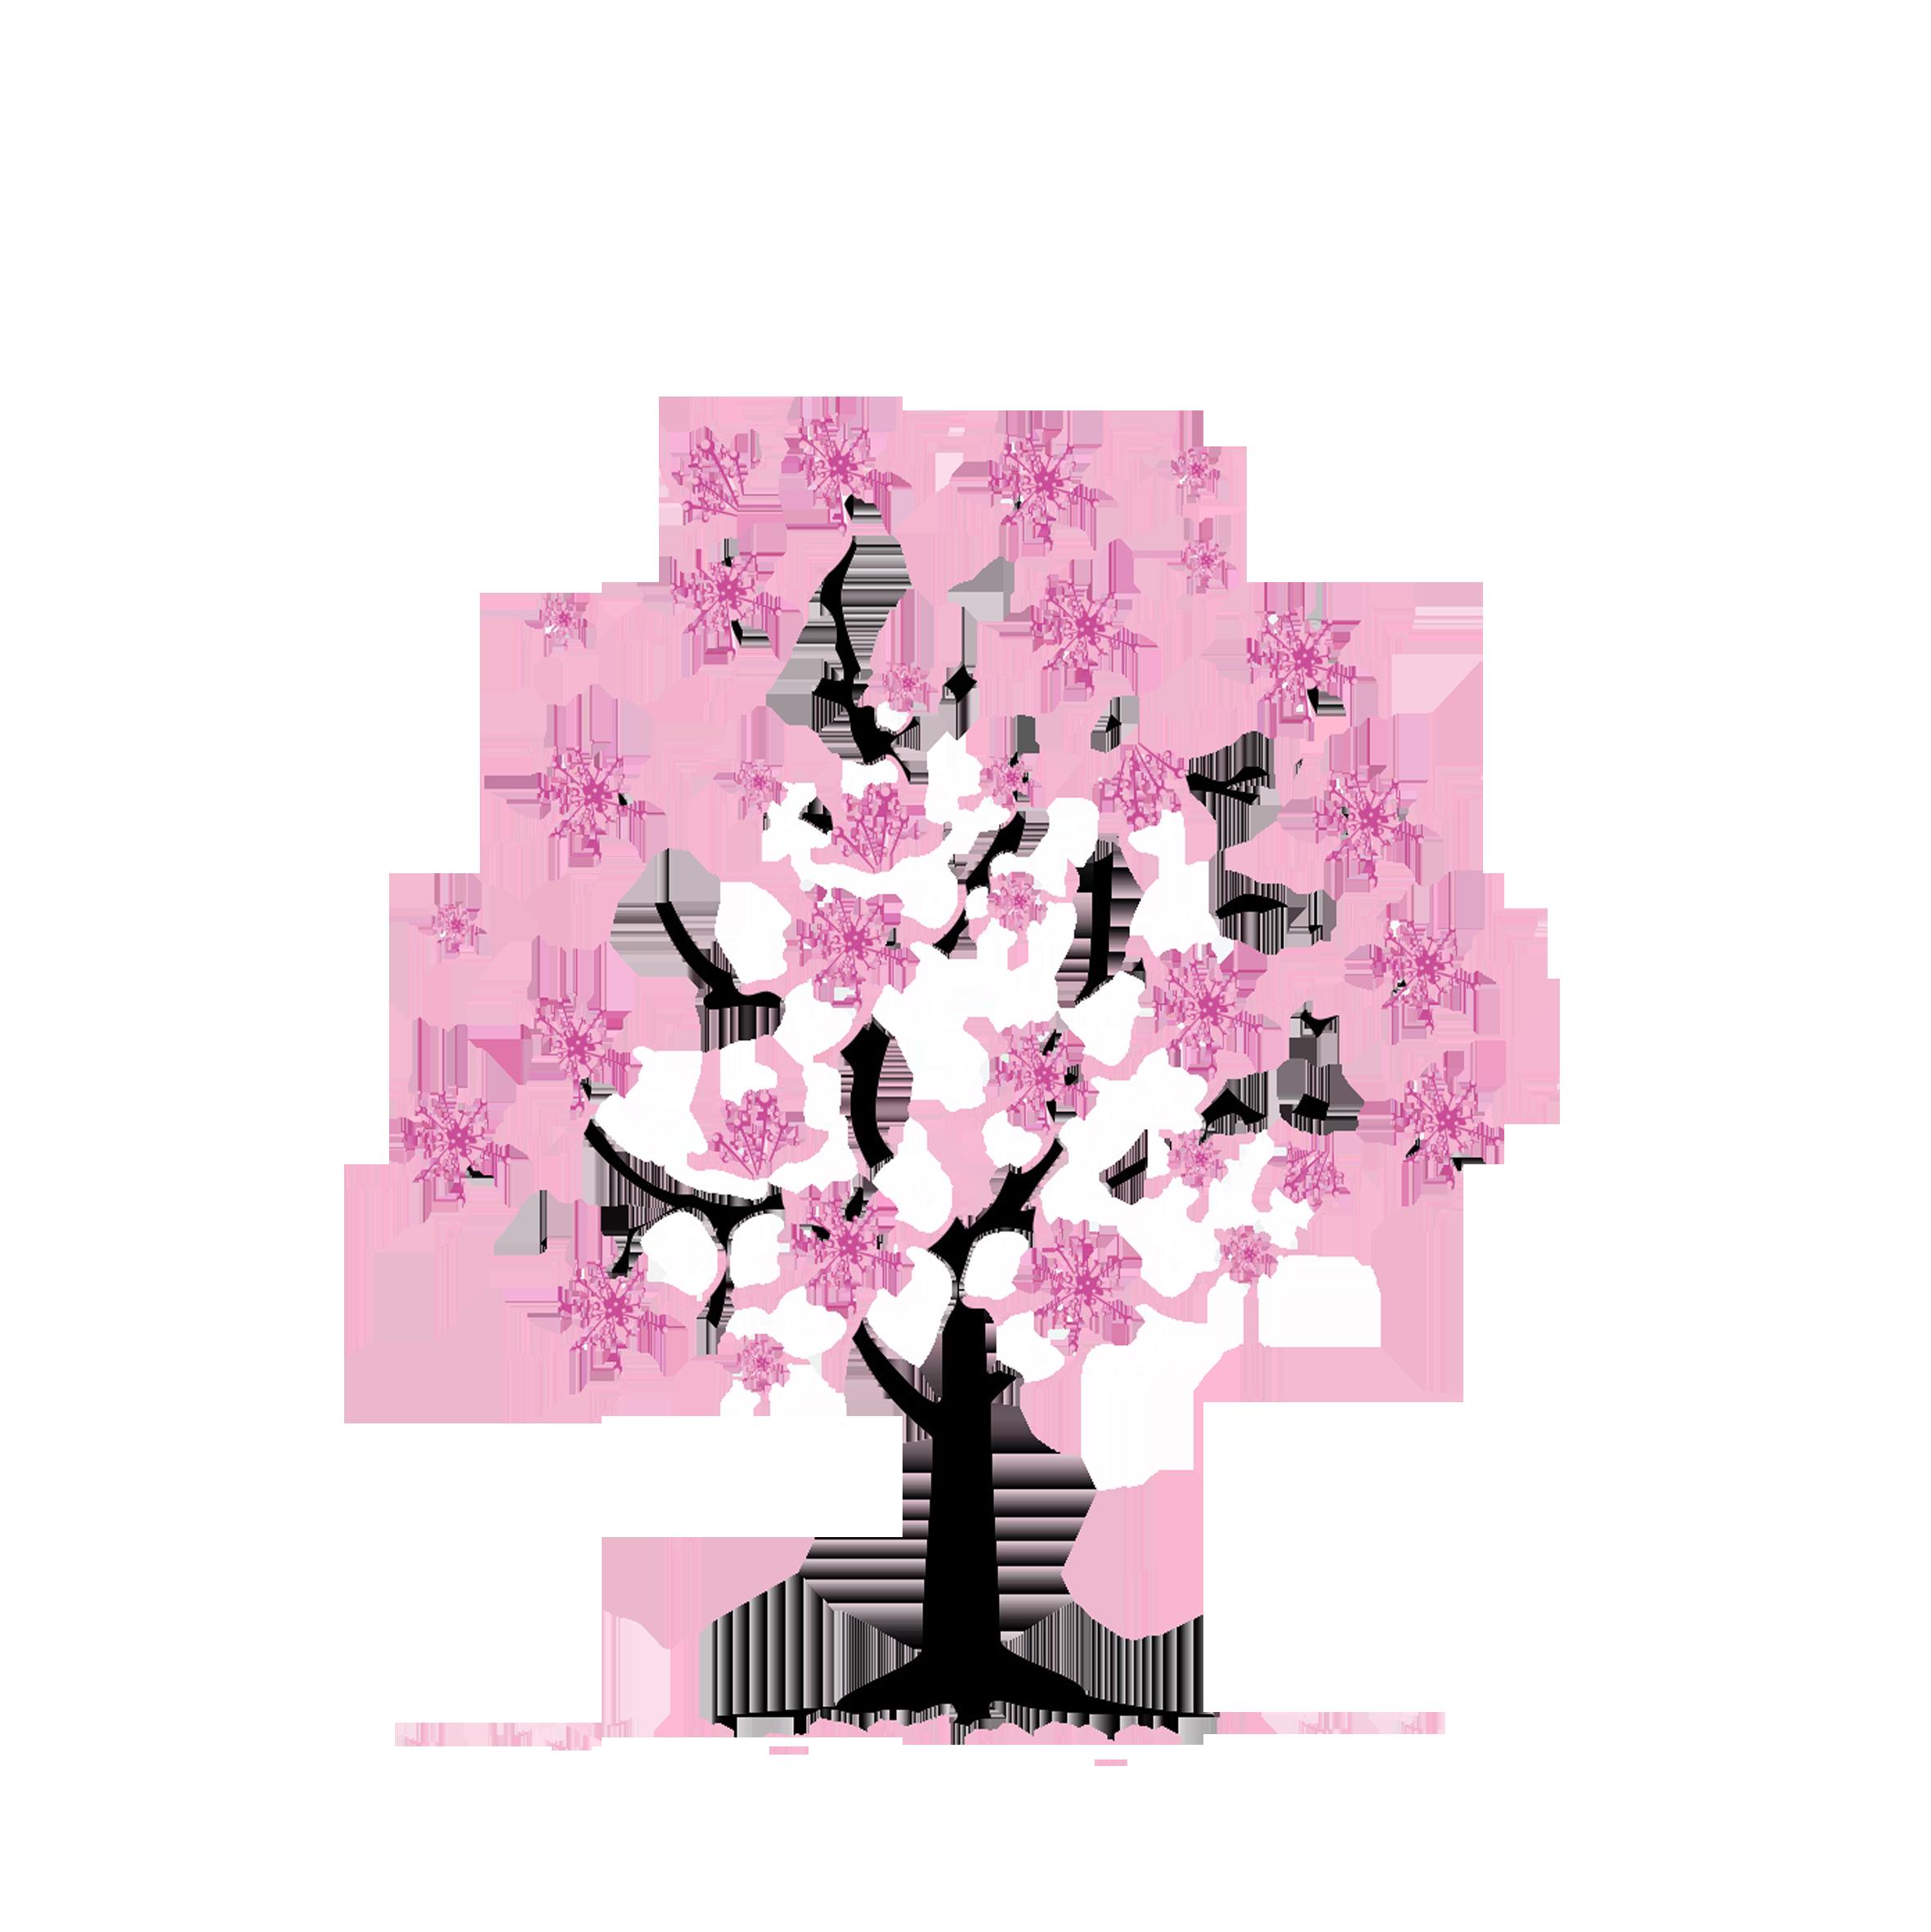 Cherry tree branch clipart graphic free stock Cherry blossom Tree Clip art - Cartoon hand-painted cherry trees ... graphic free stock